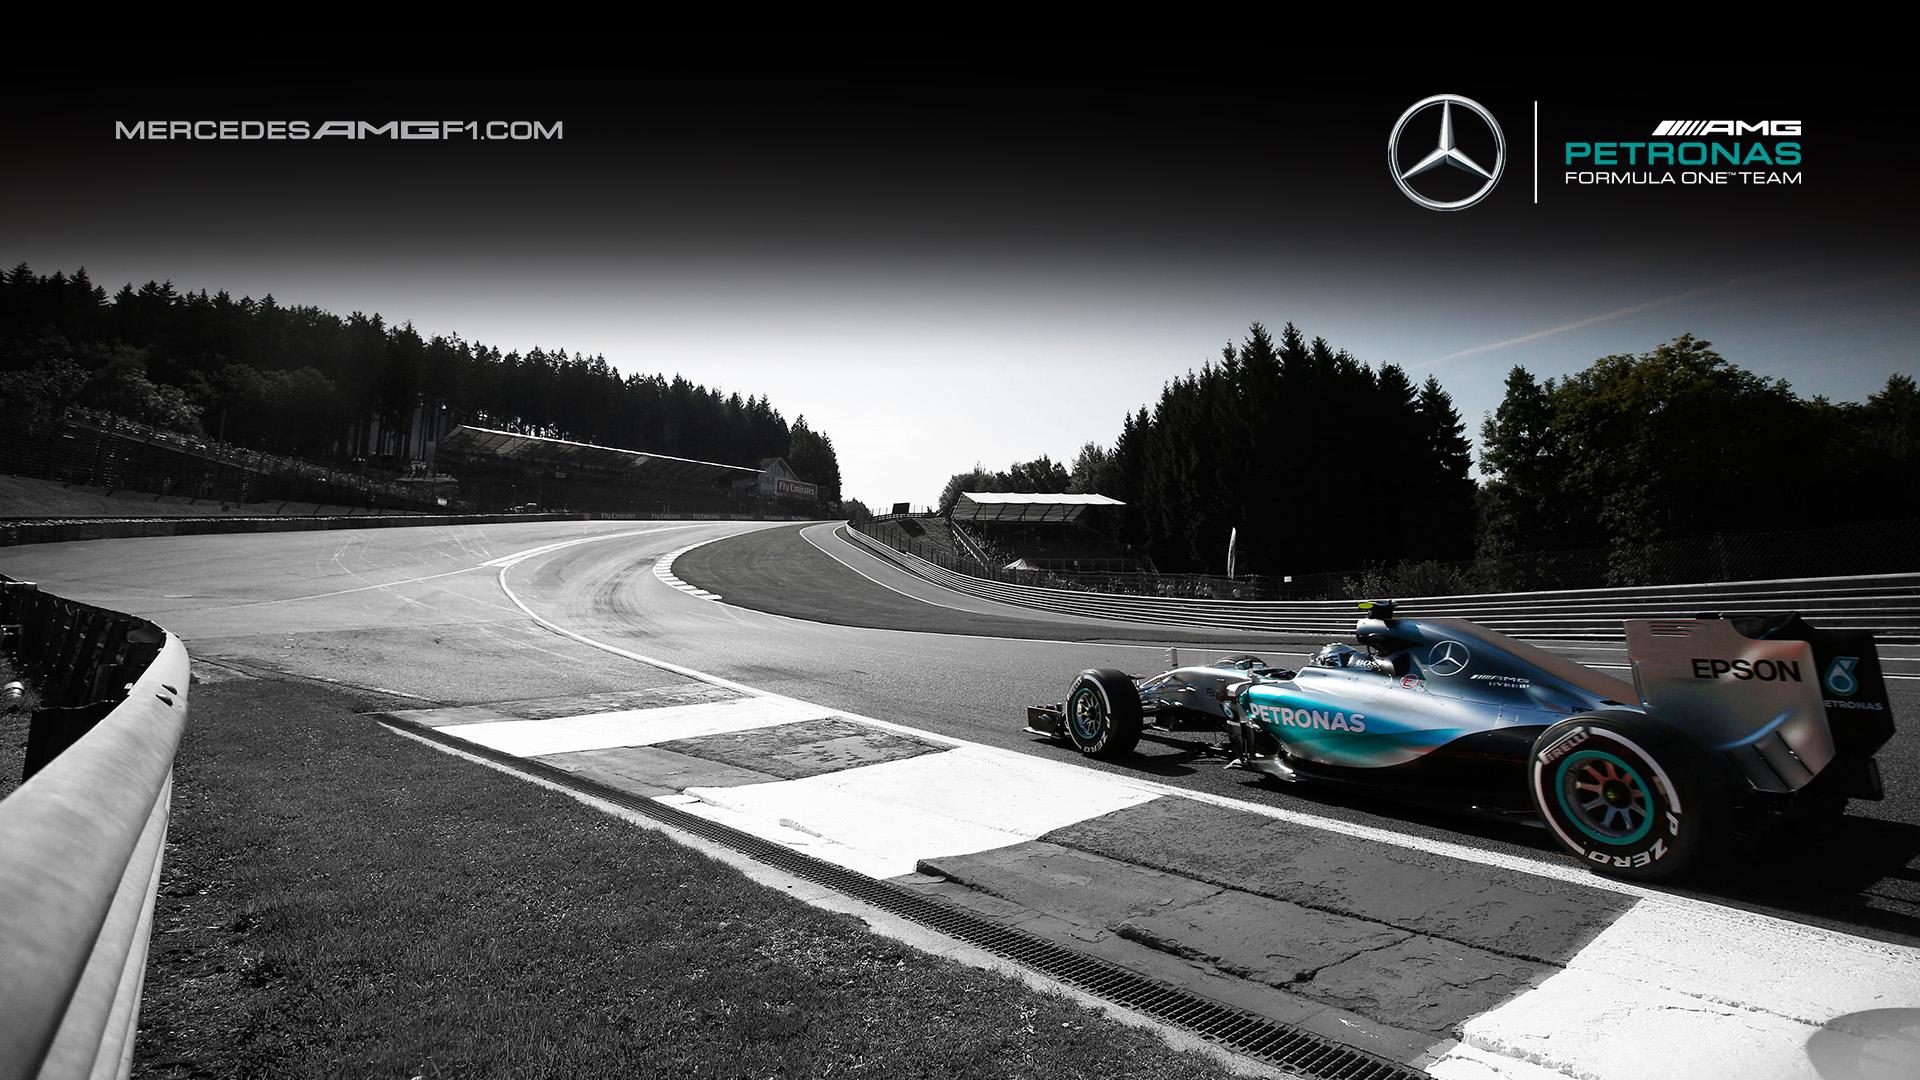 Video Inside A Mercedes Amg F1 Hybrid Power Unit Image 443651